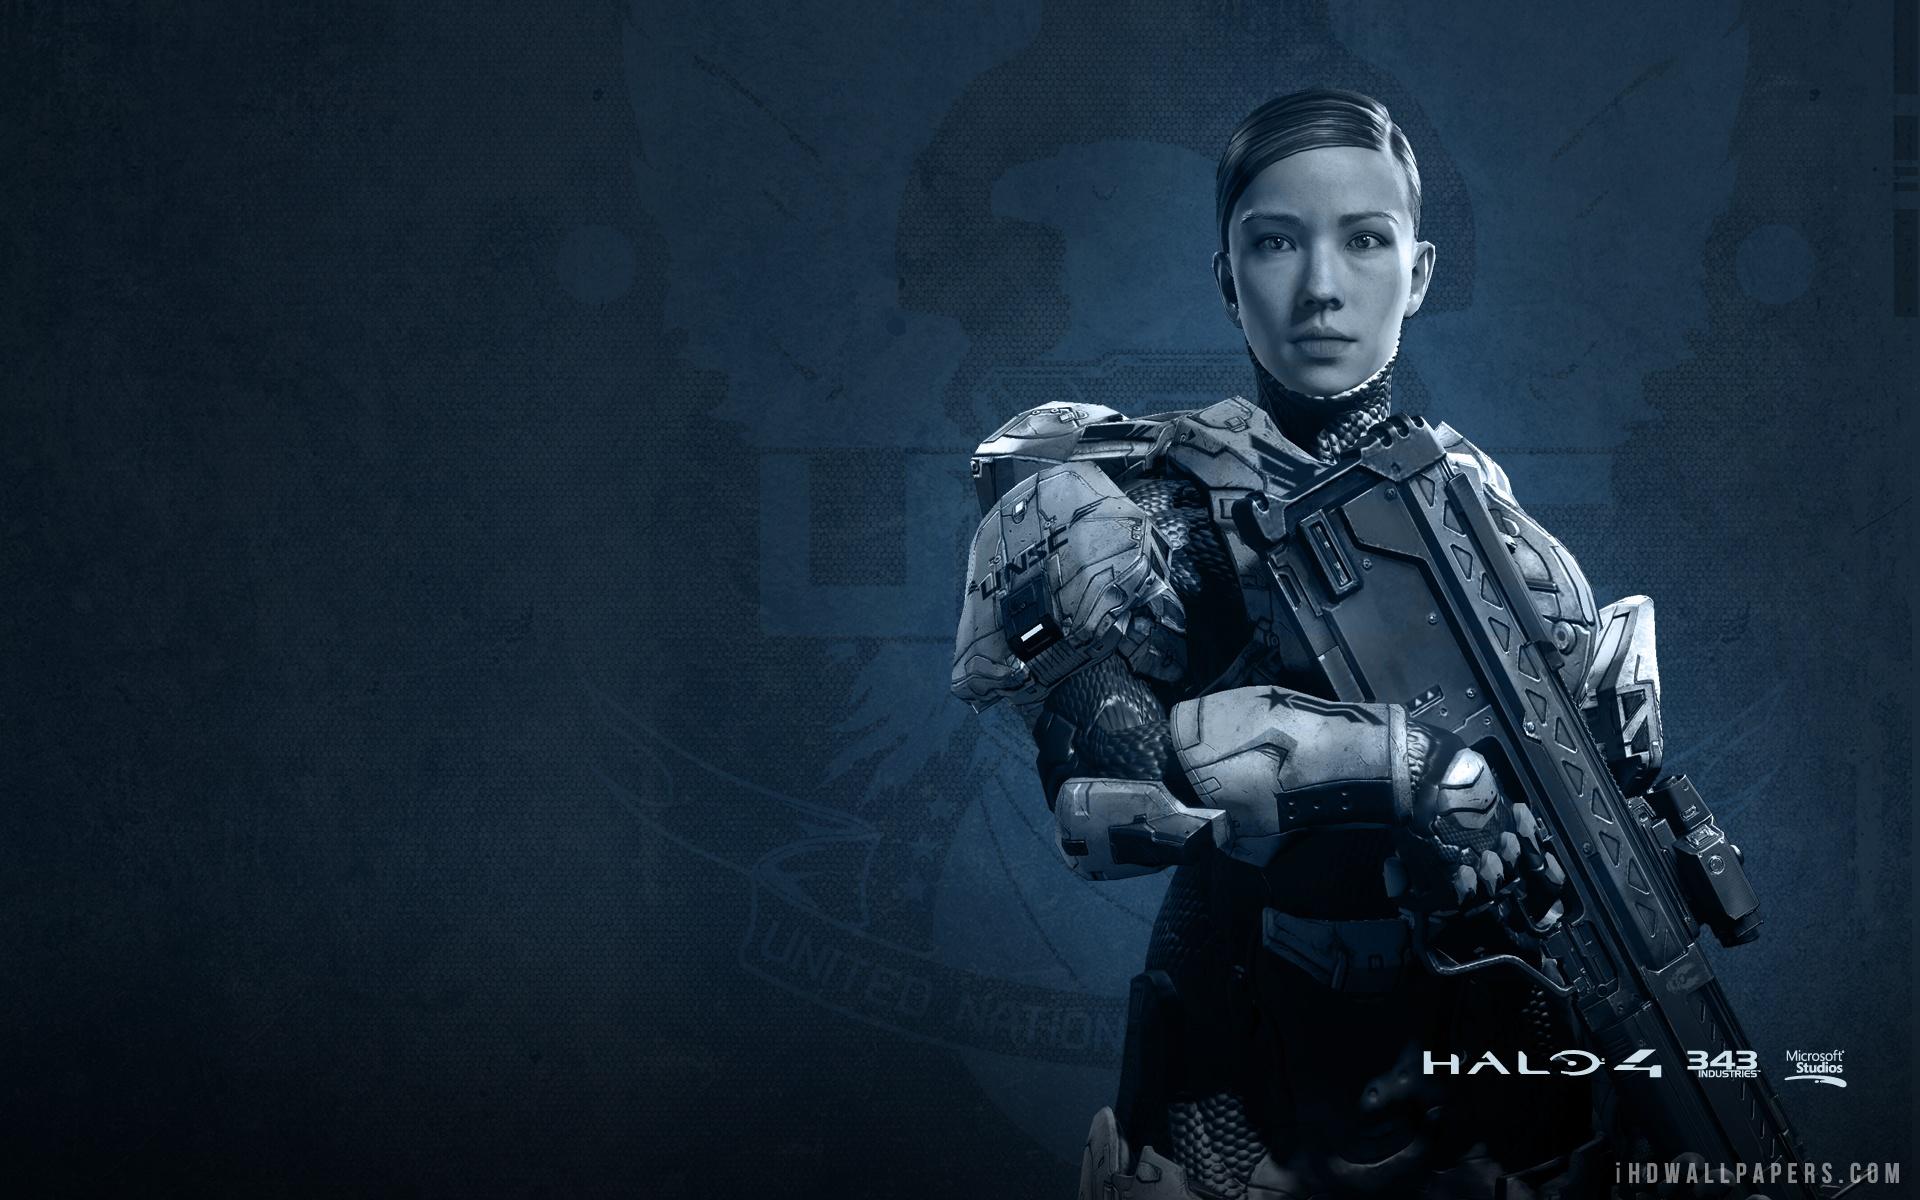 Commander Sara Palmer in Halo 4 Wallpaper 1920x1200